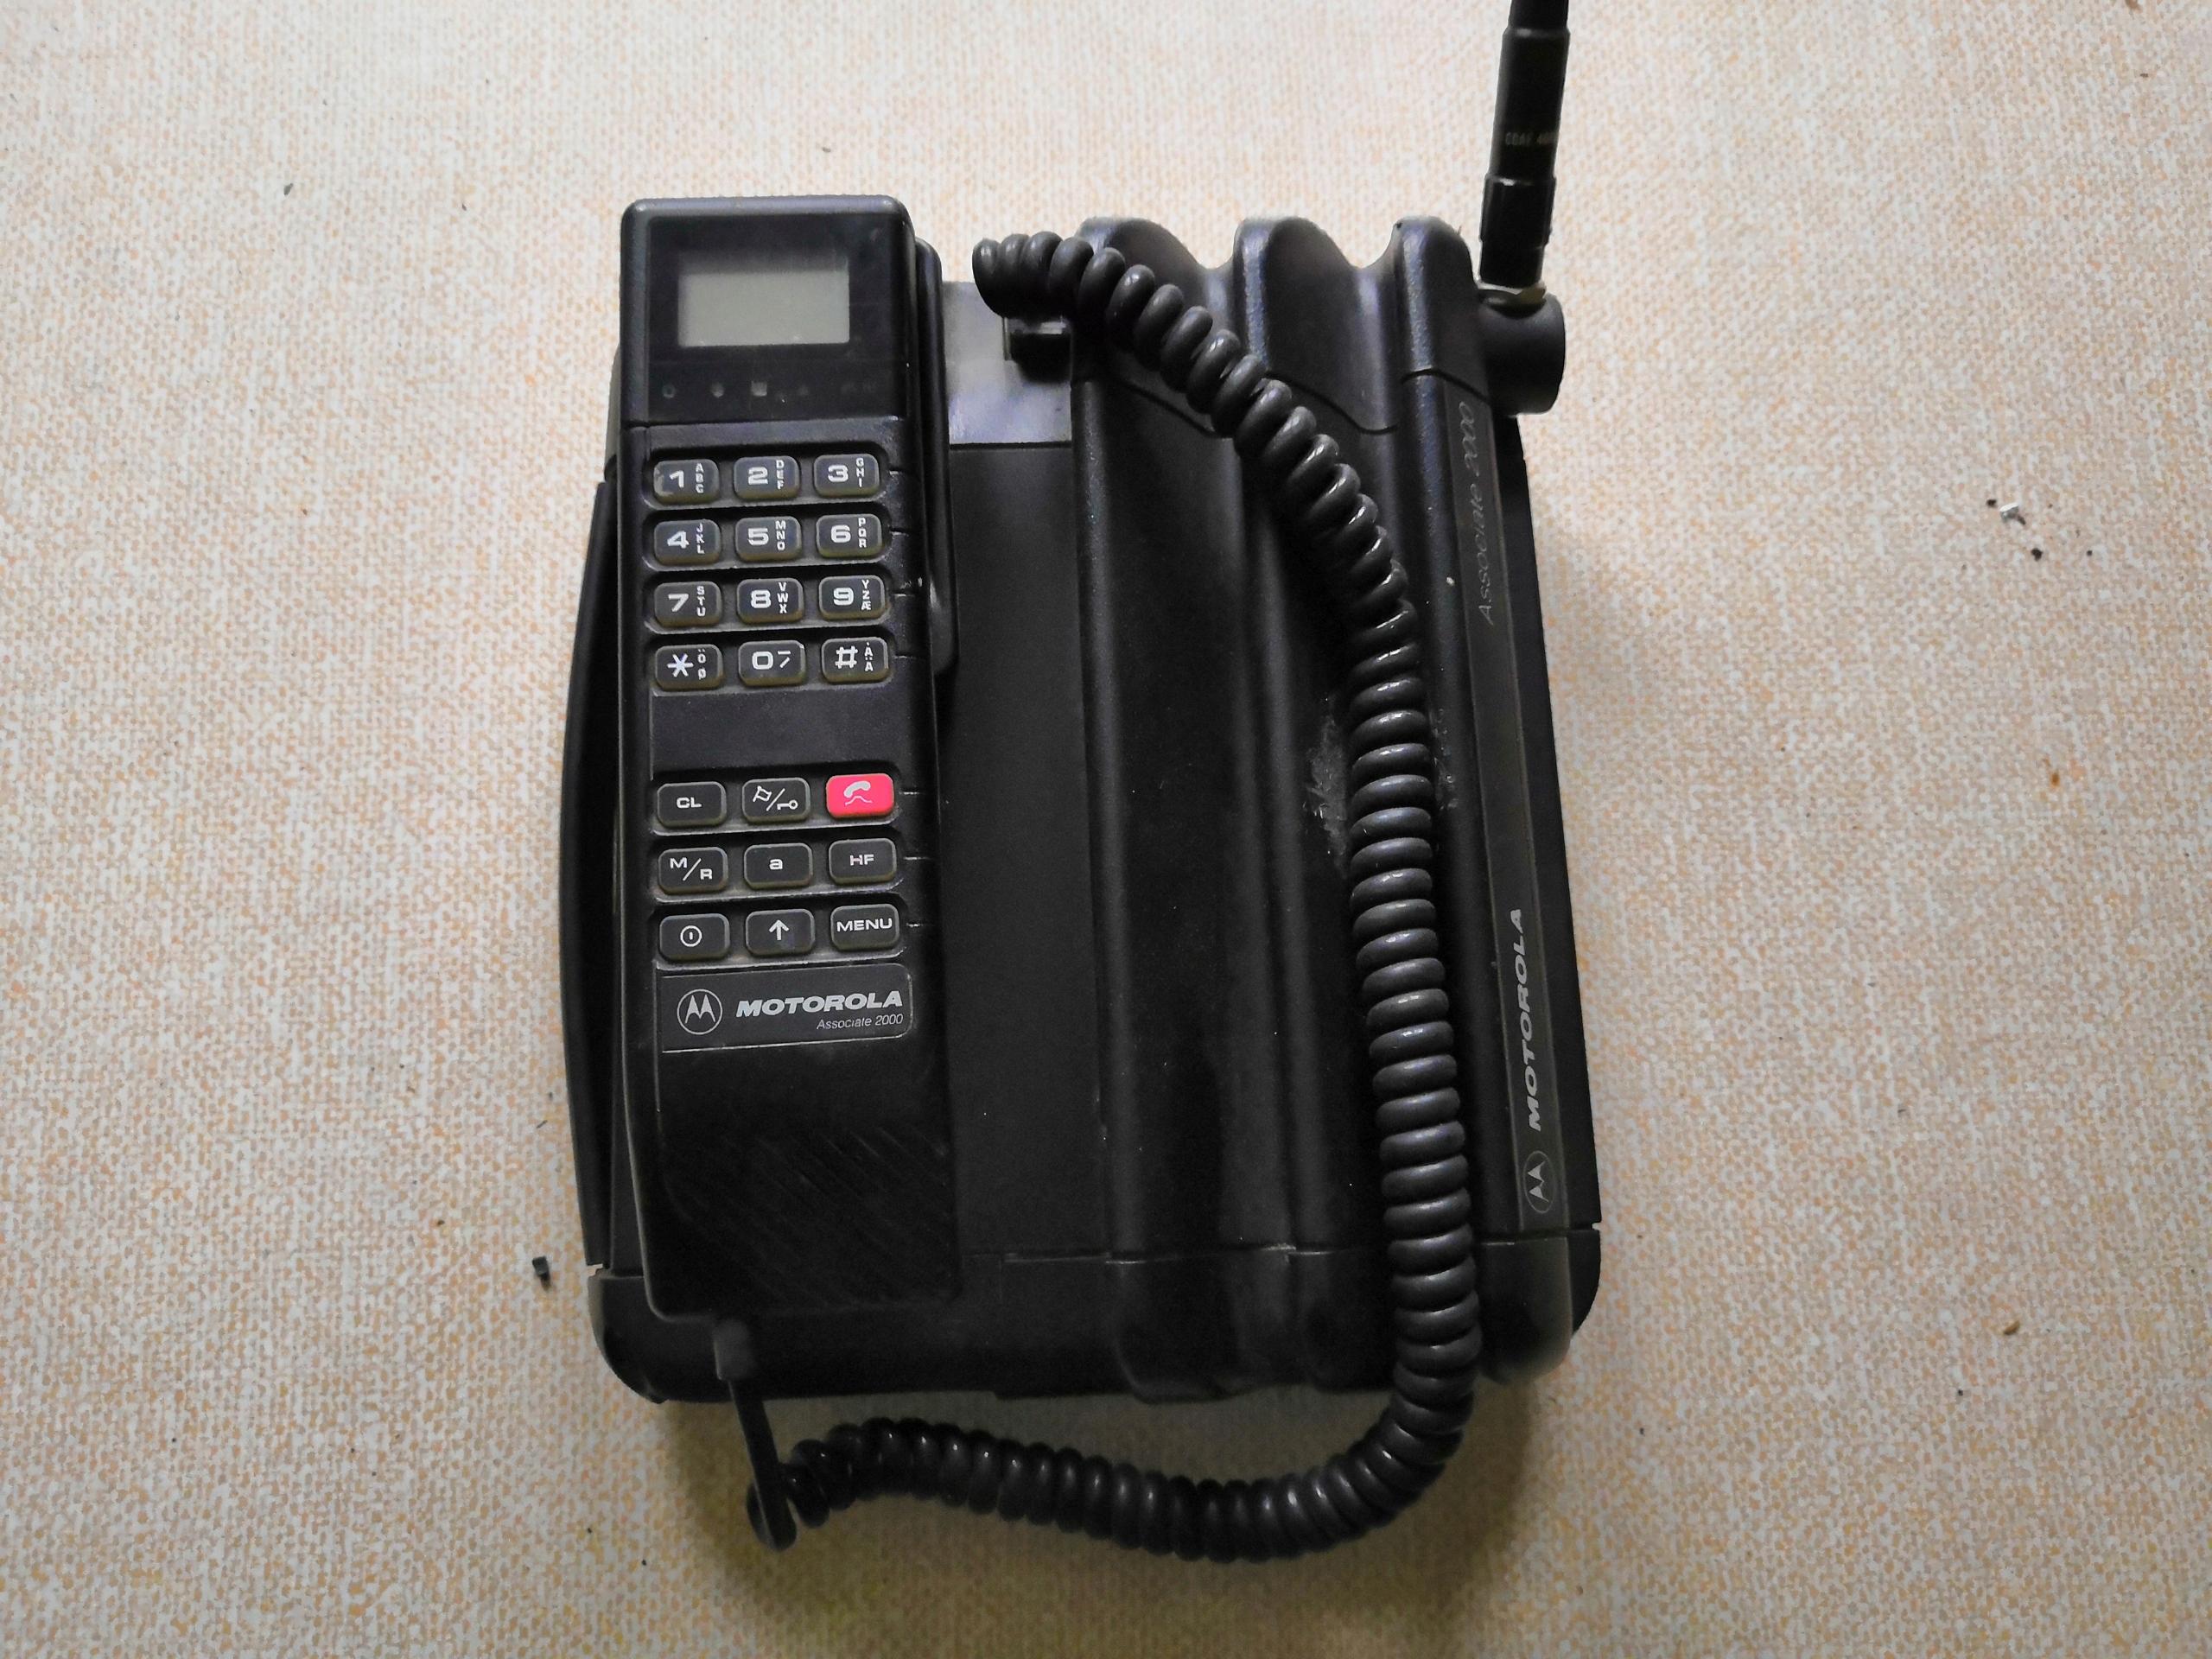 Aktualne Motorola associate 2000 Retro ! - 7692695043 - oficjalne archiwum QY95